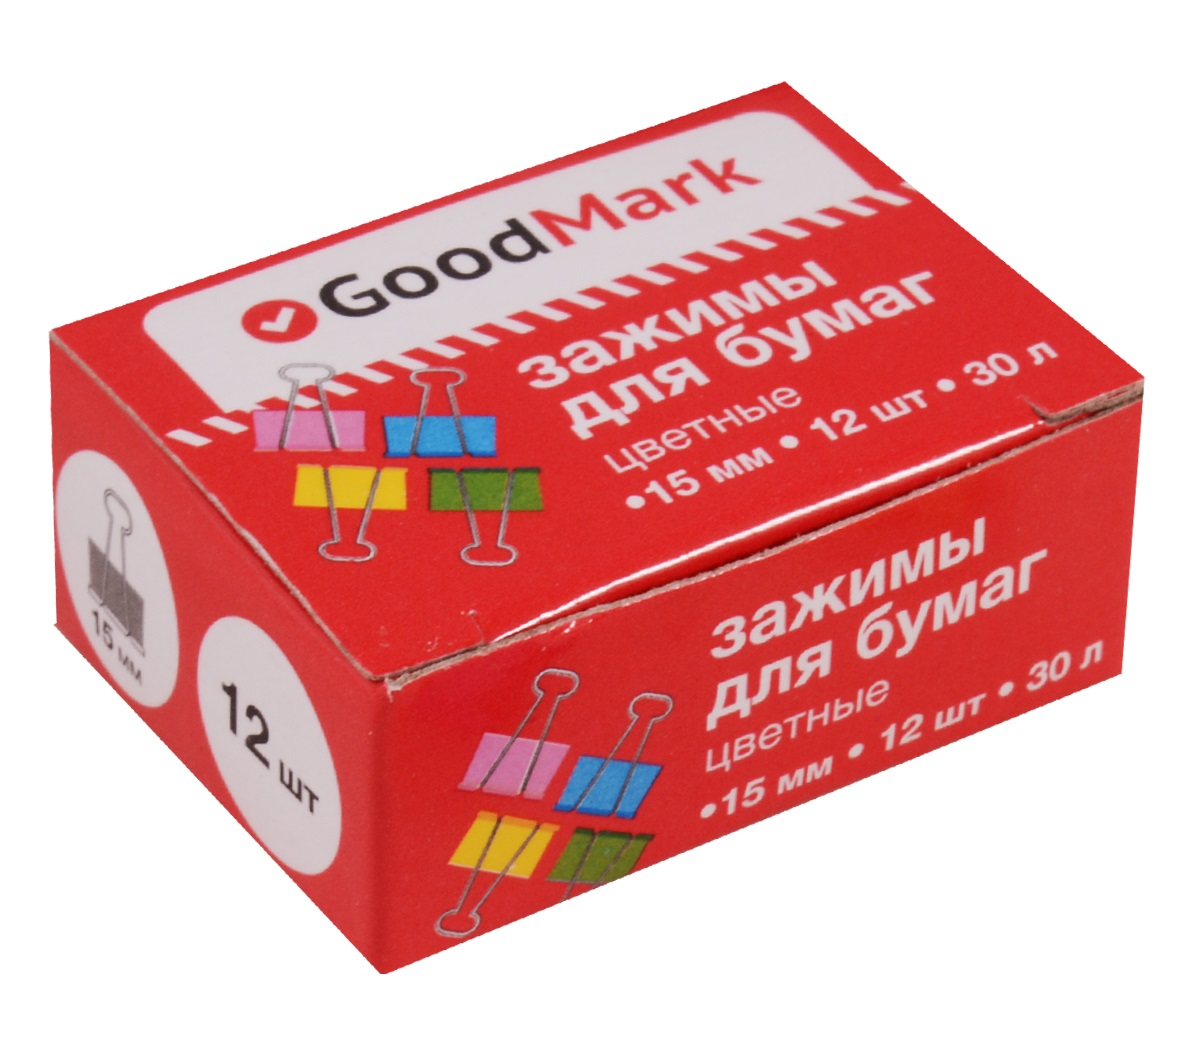 Зажимы для бумаг цветные, 15 мм, 12 шт, GoodMark